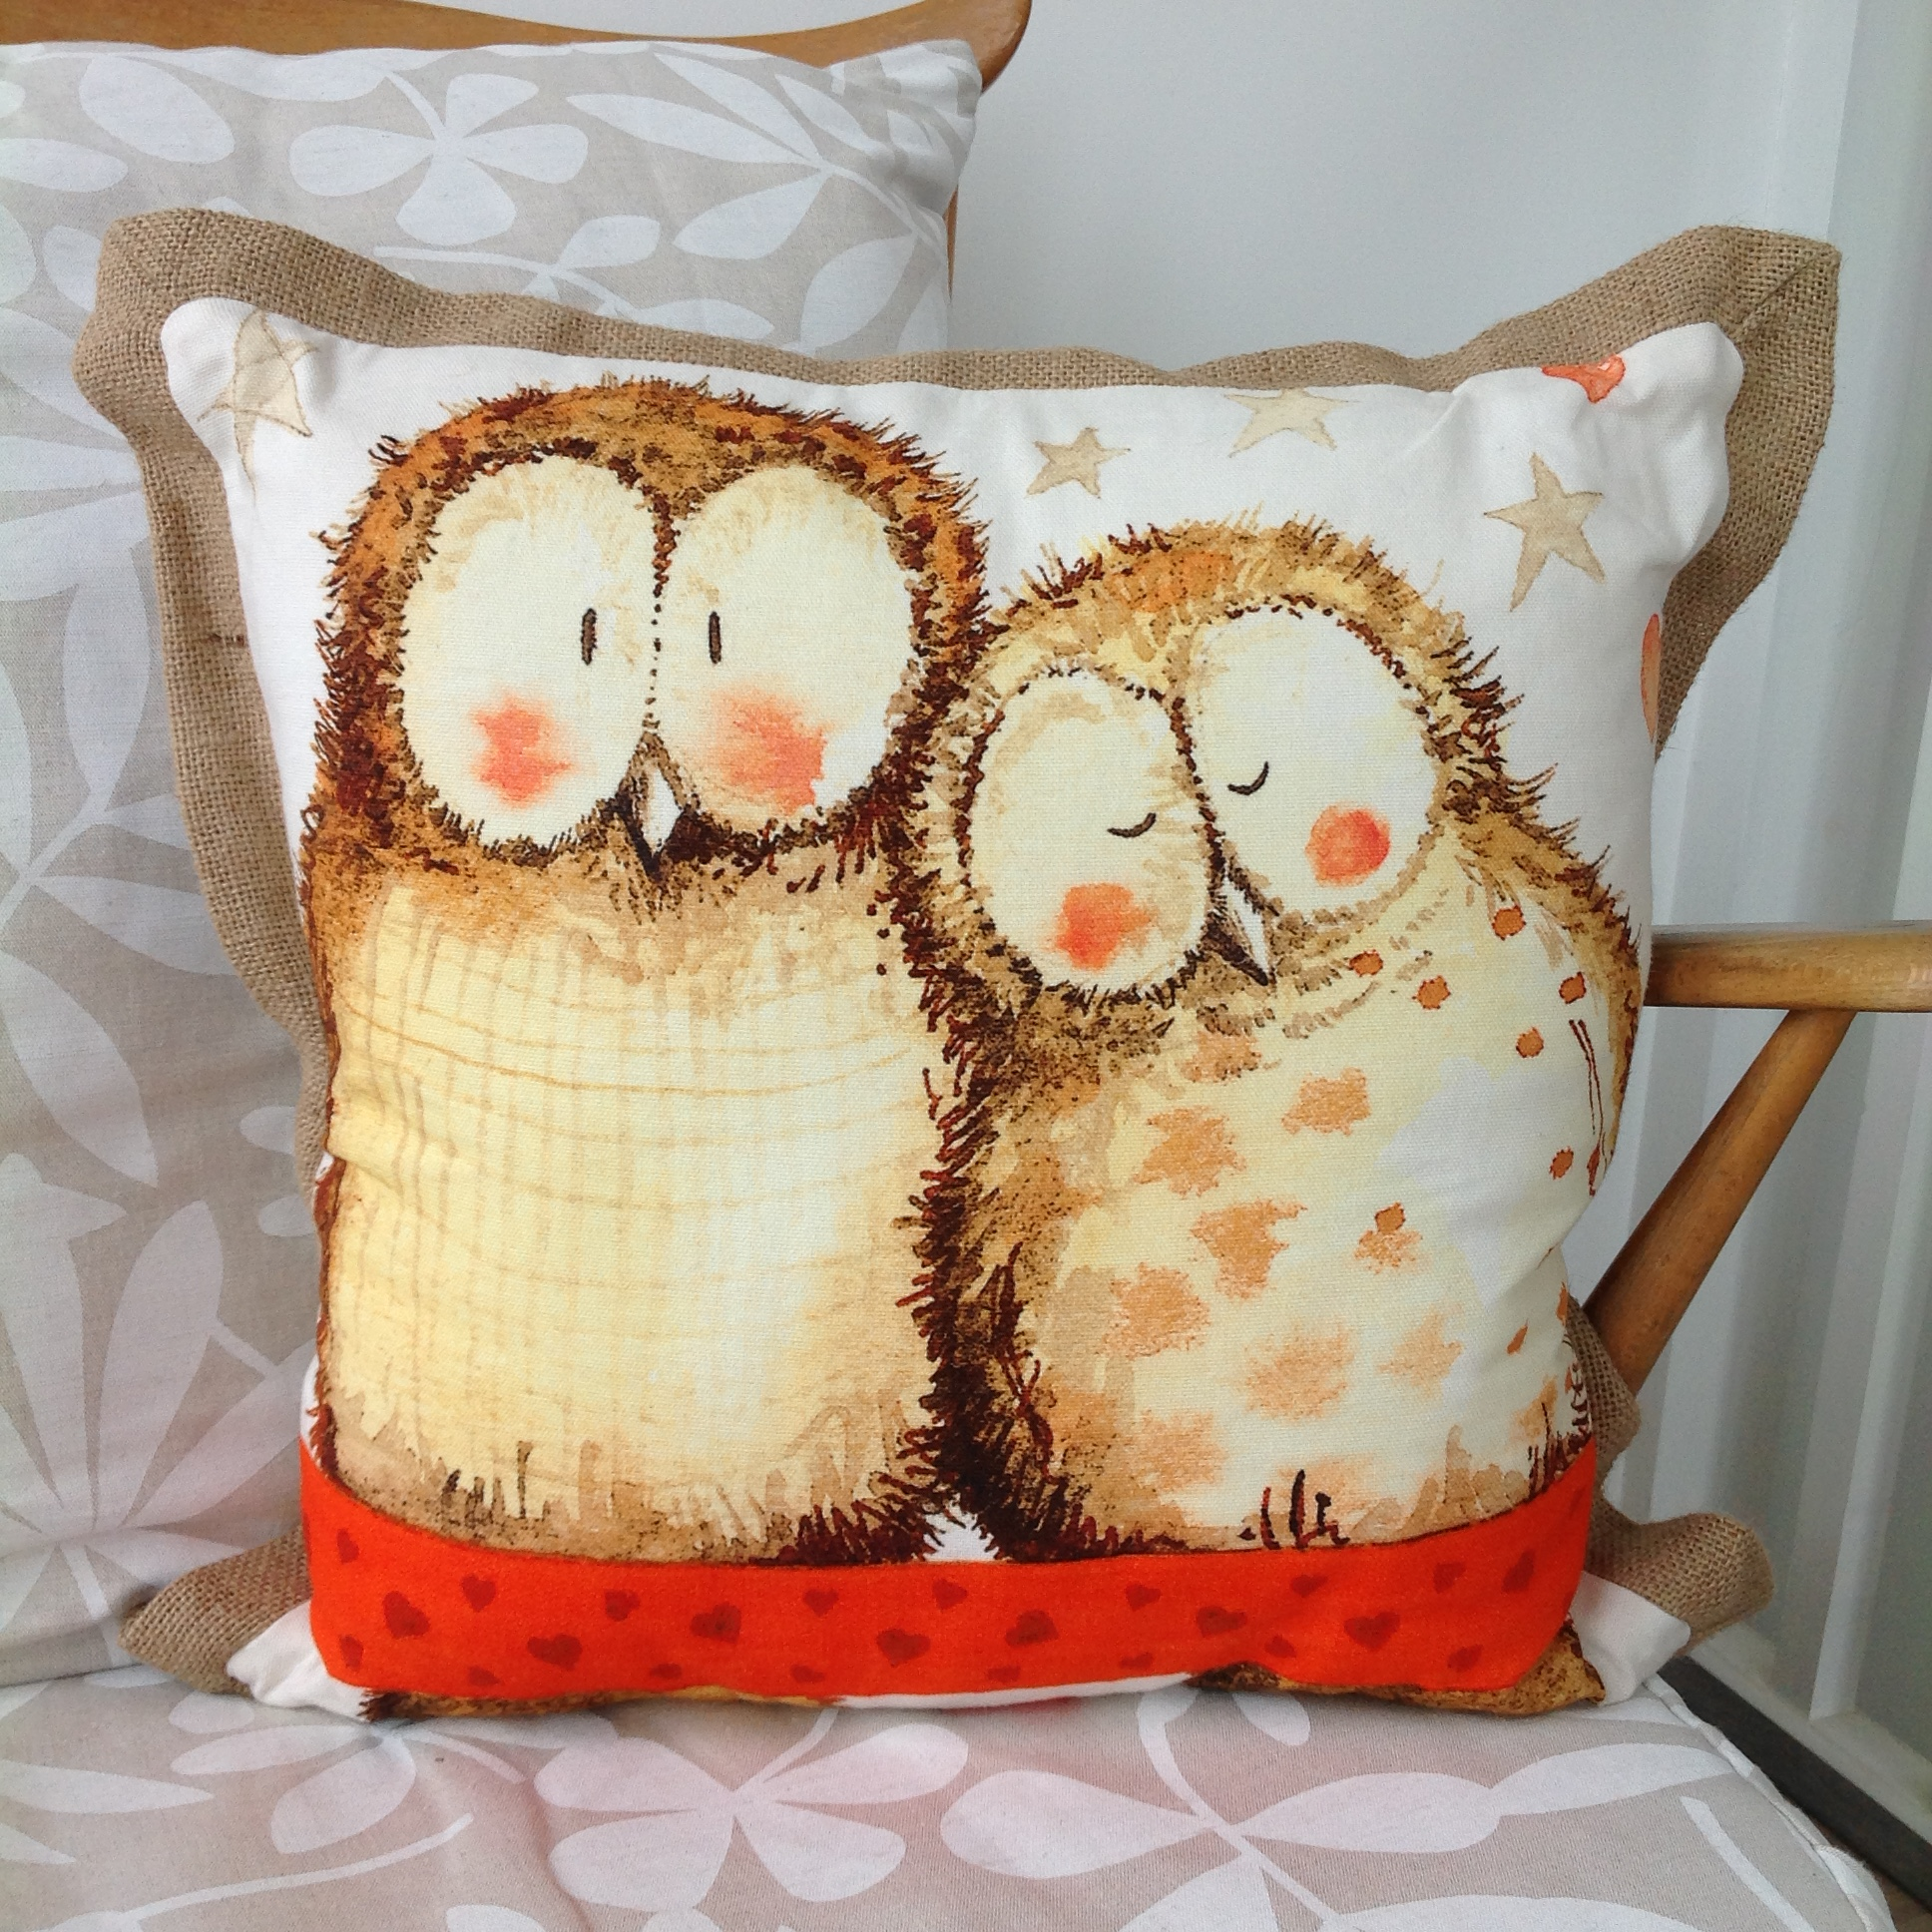 catalog/products/cushions/owls-cushion.JPG